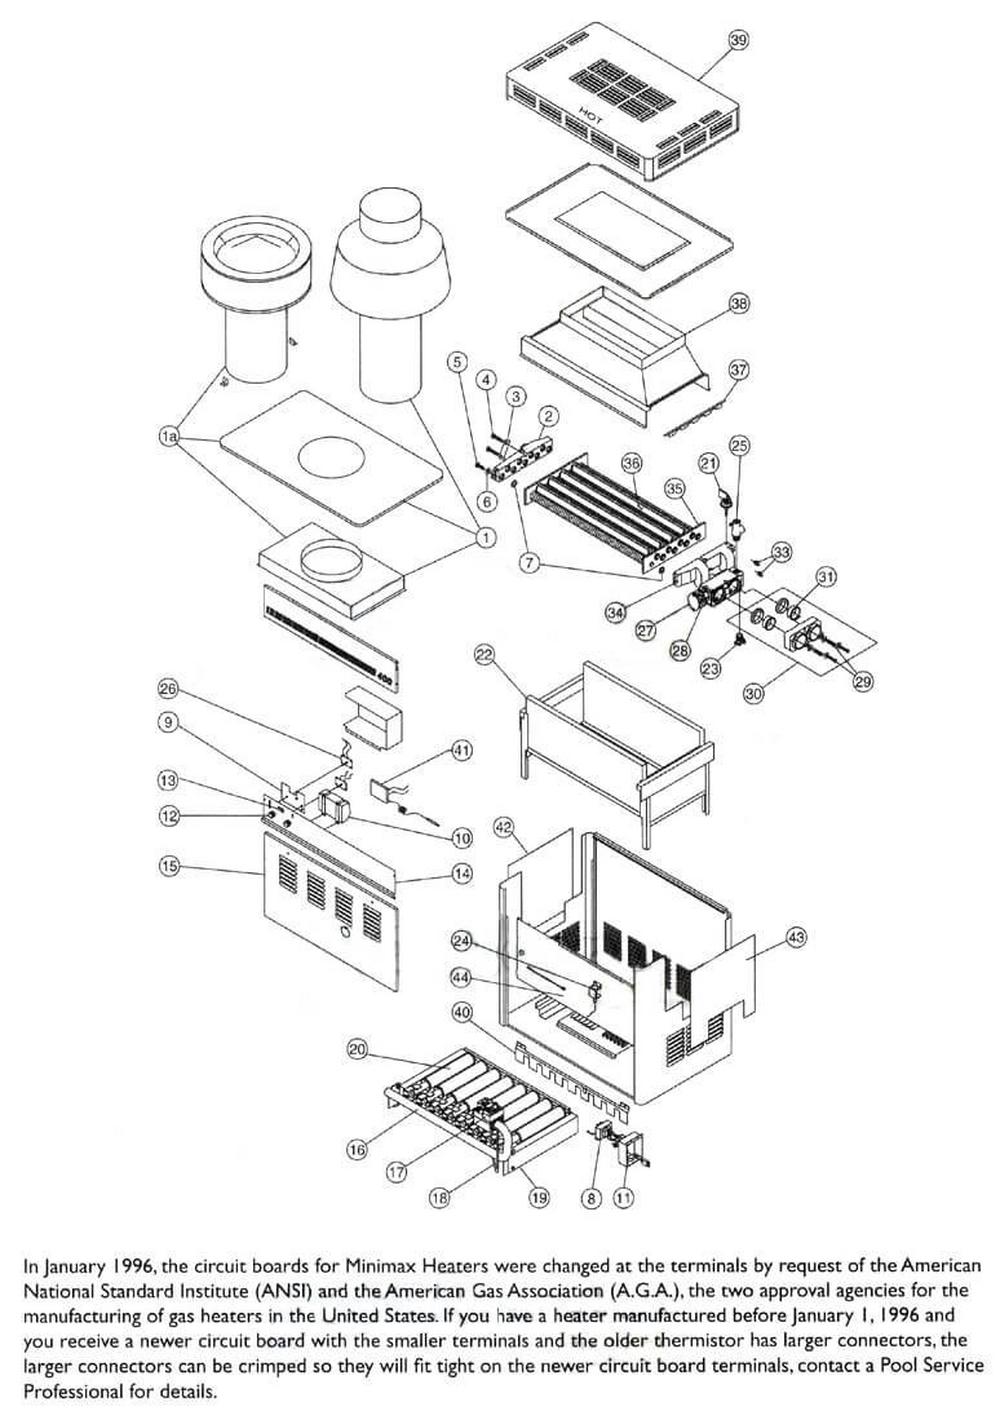 Purex Minimax Plus Heater Page 1 image